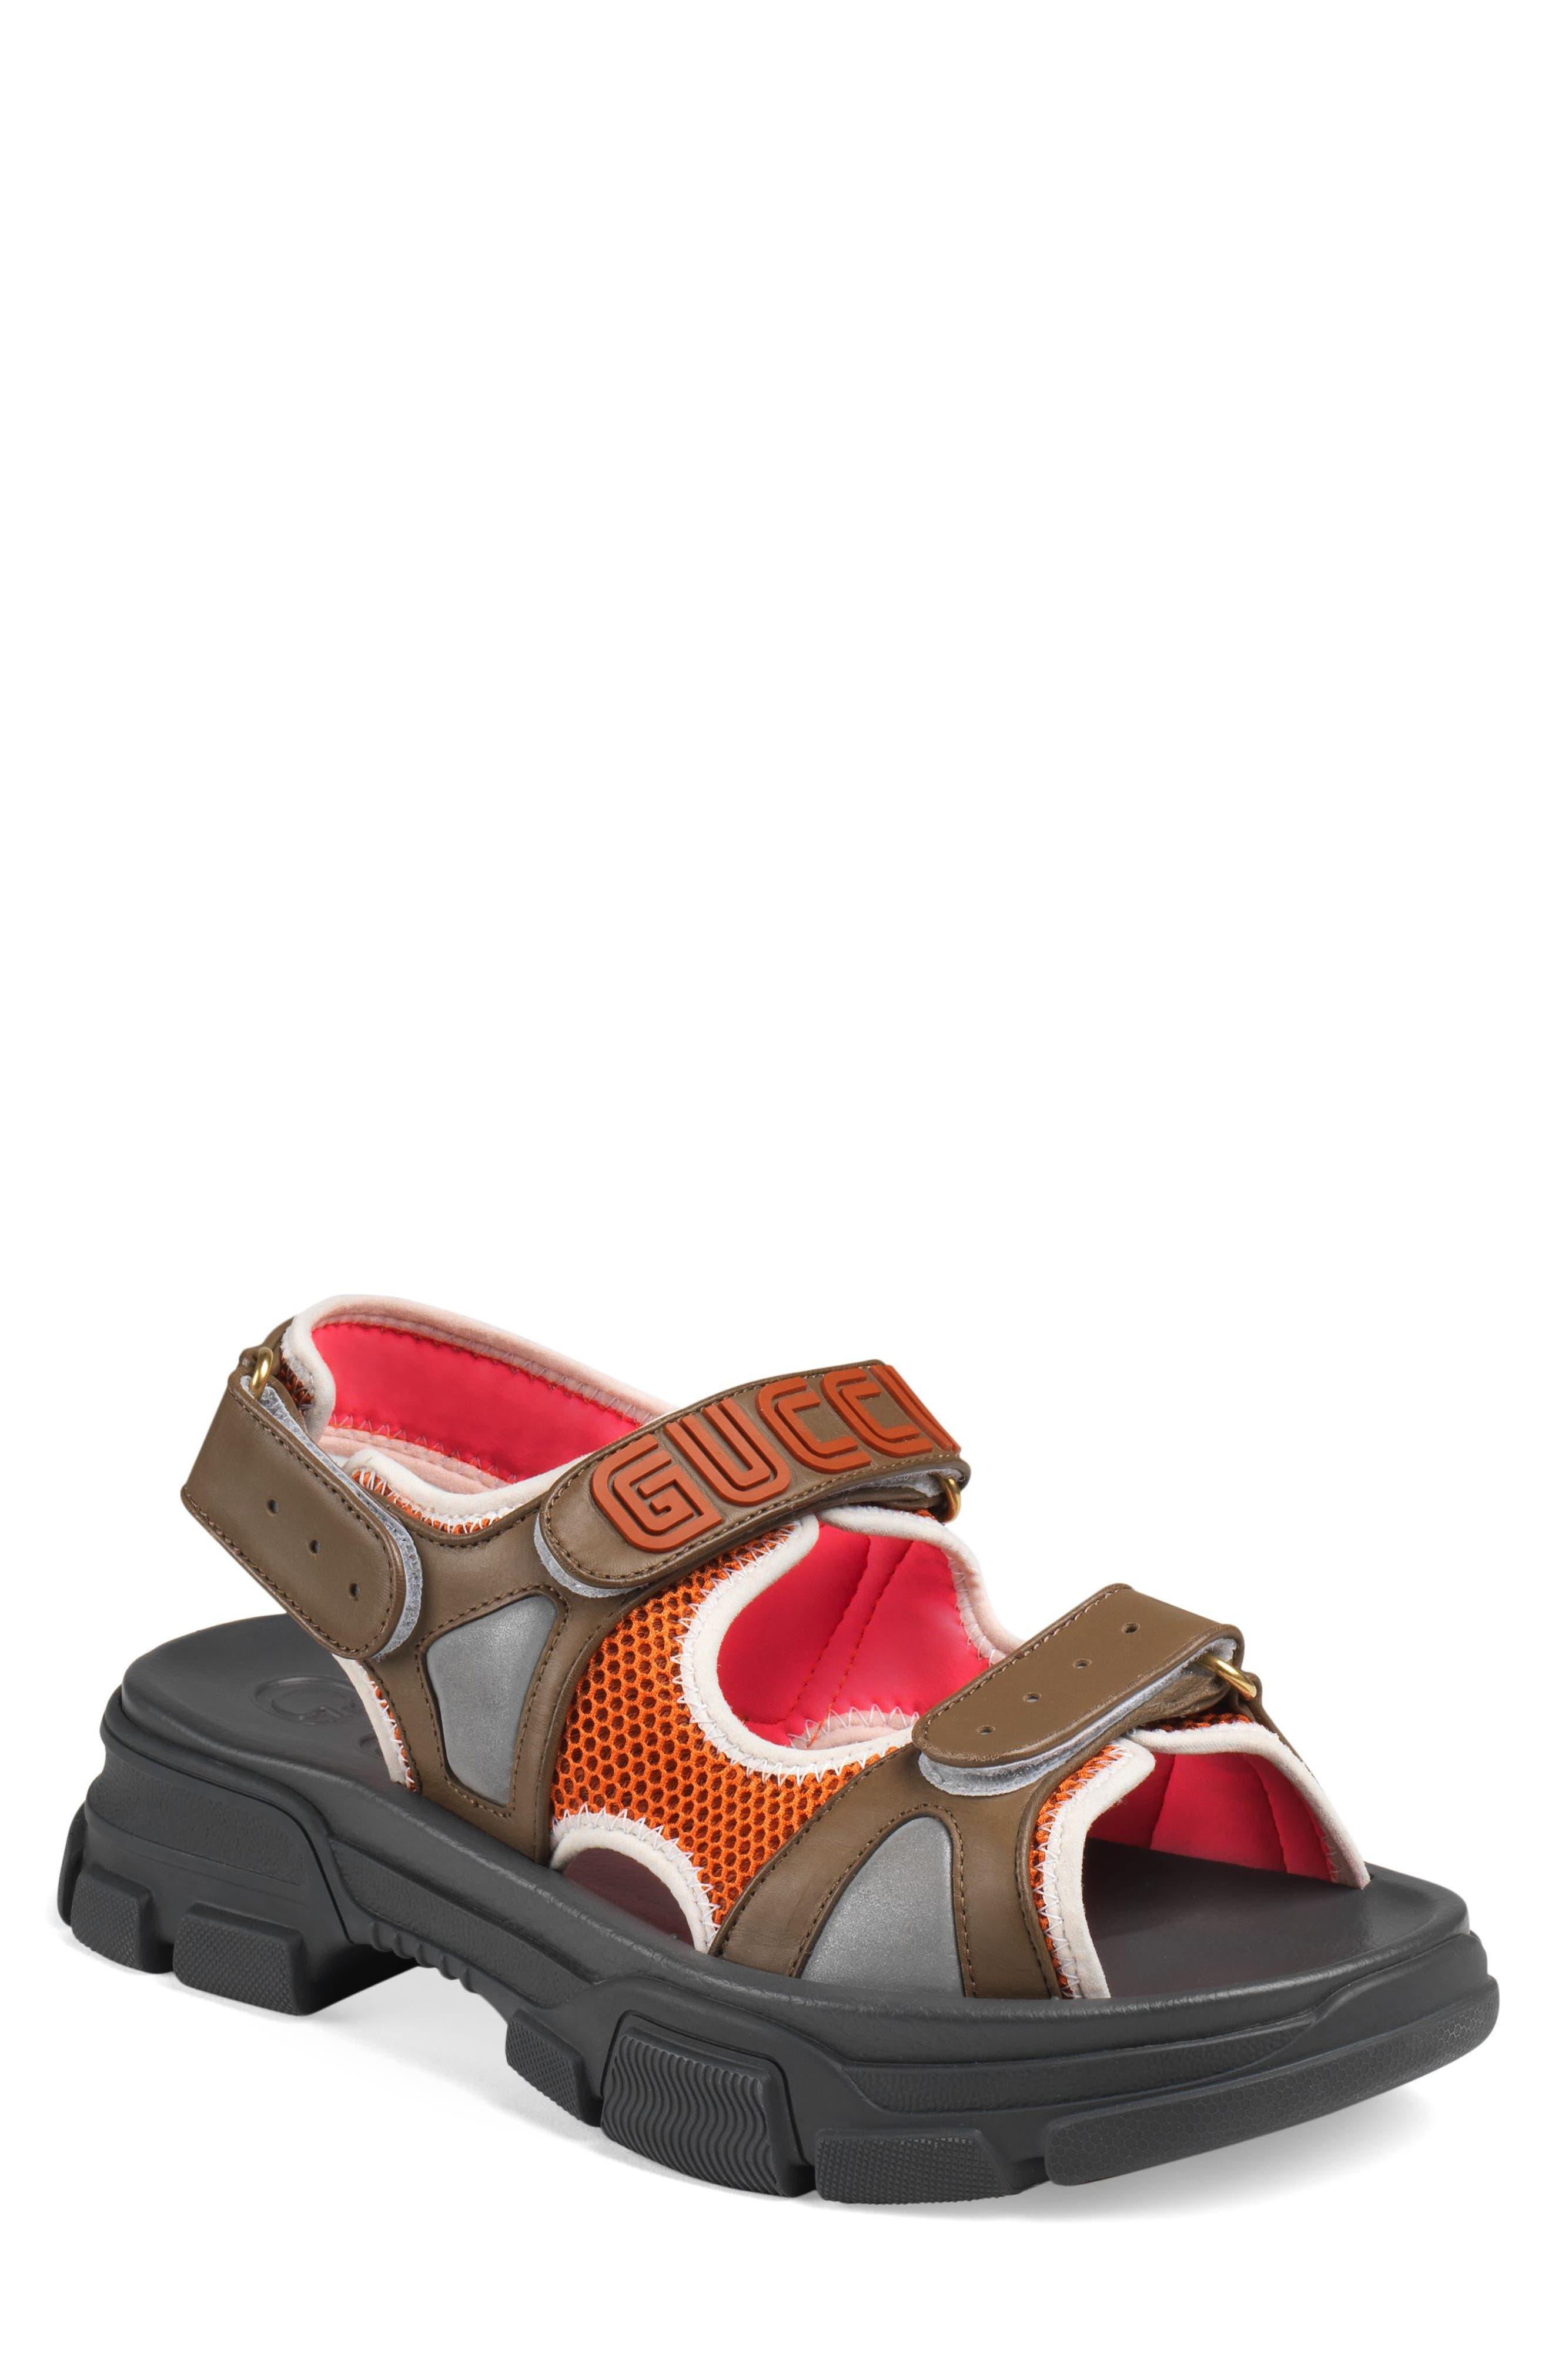 Agru Sport Sandal,                         Main,                         color, BROWN